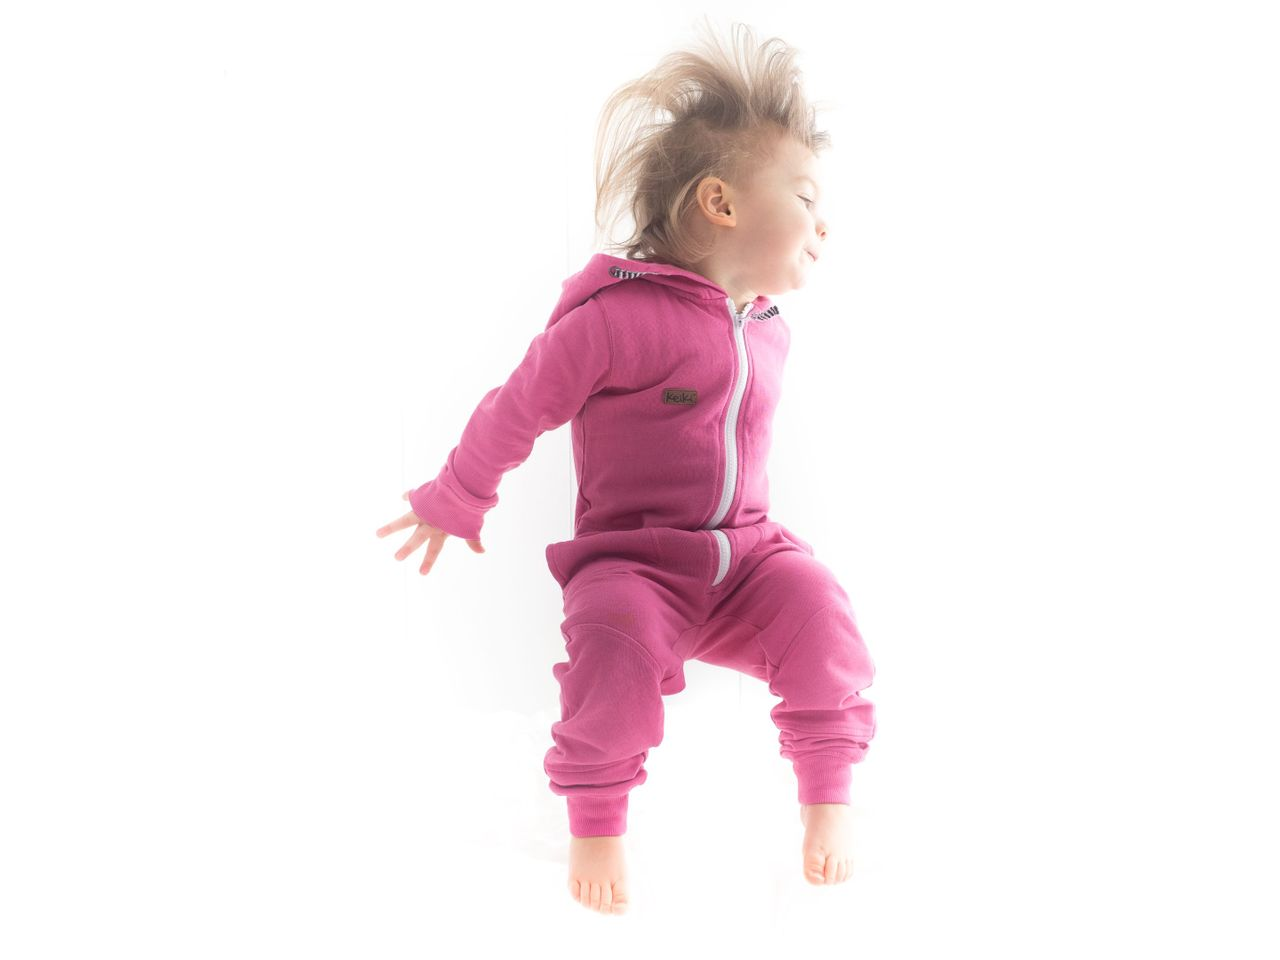 Copy of Ava jumping pink (1 of 1)-4.jpg